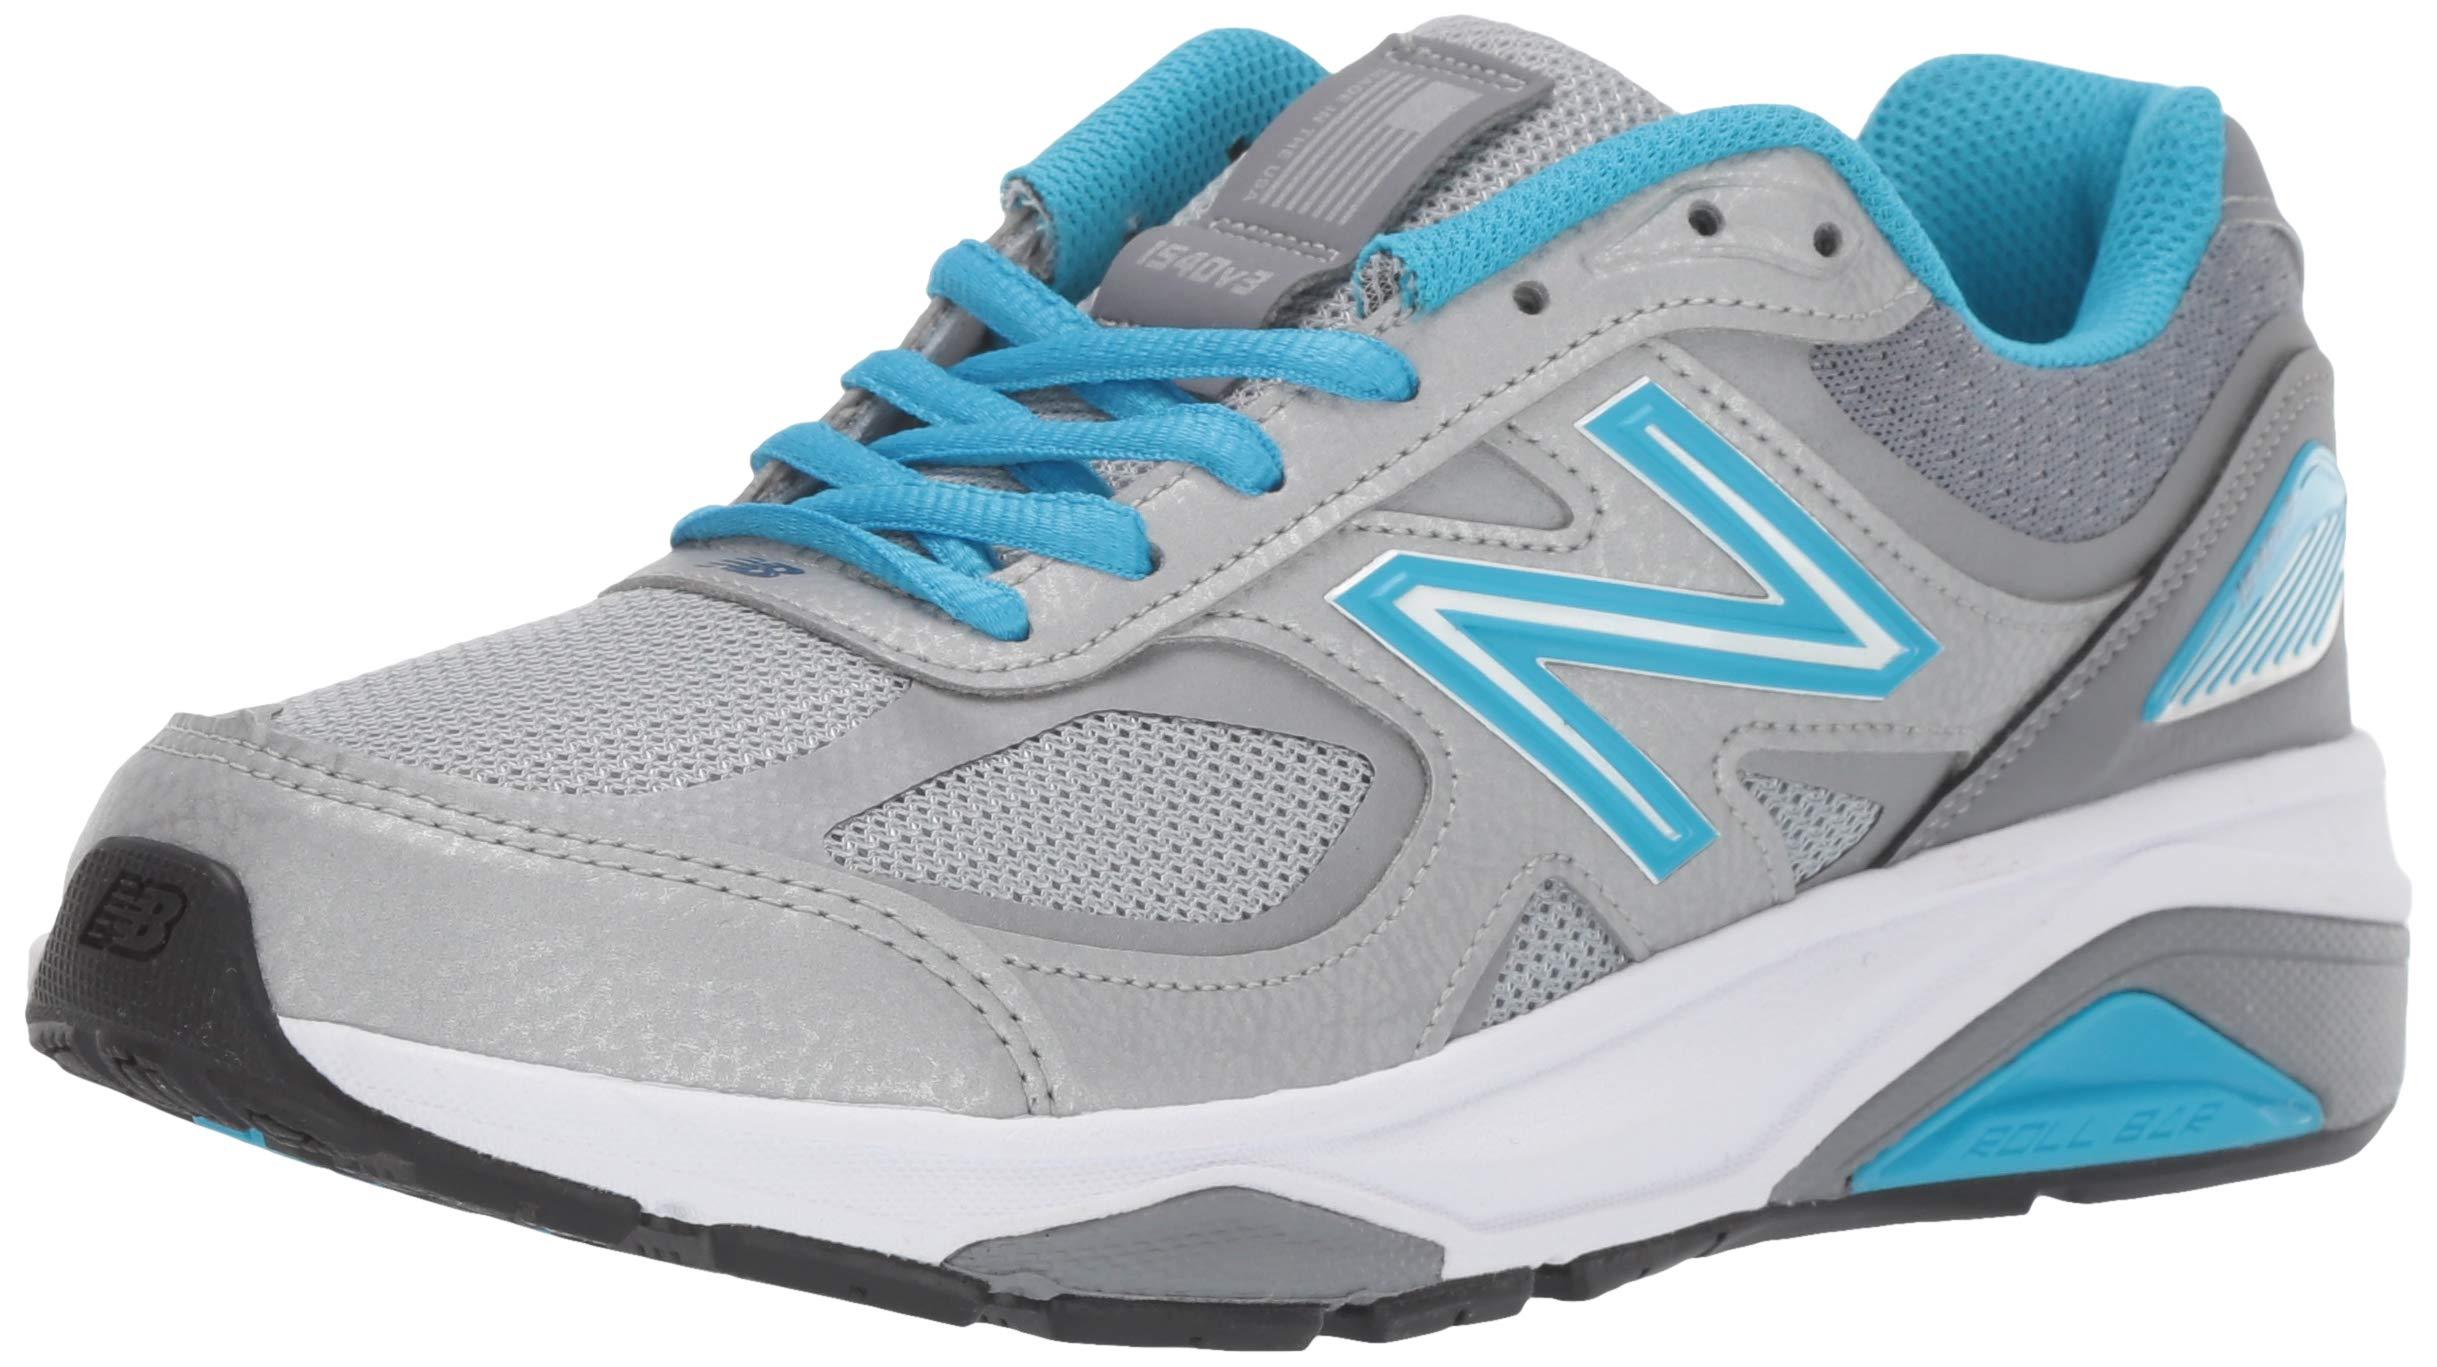 New Balance Women's 1540v3 Running Shoe, Silver/Polaris, 5 M US